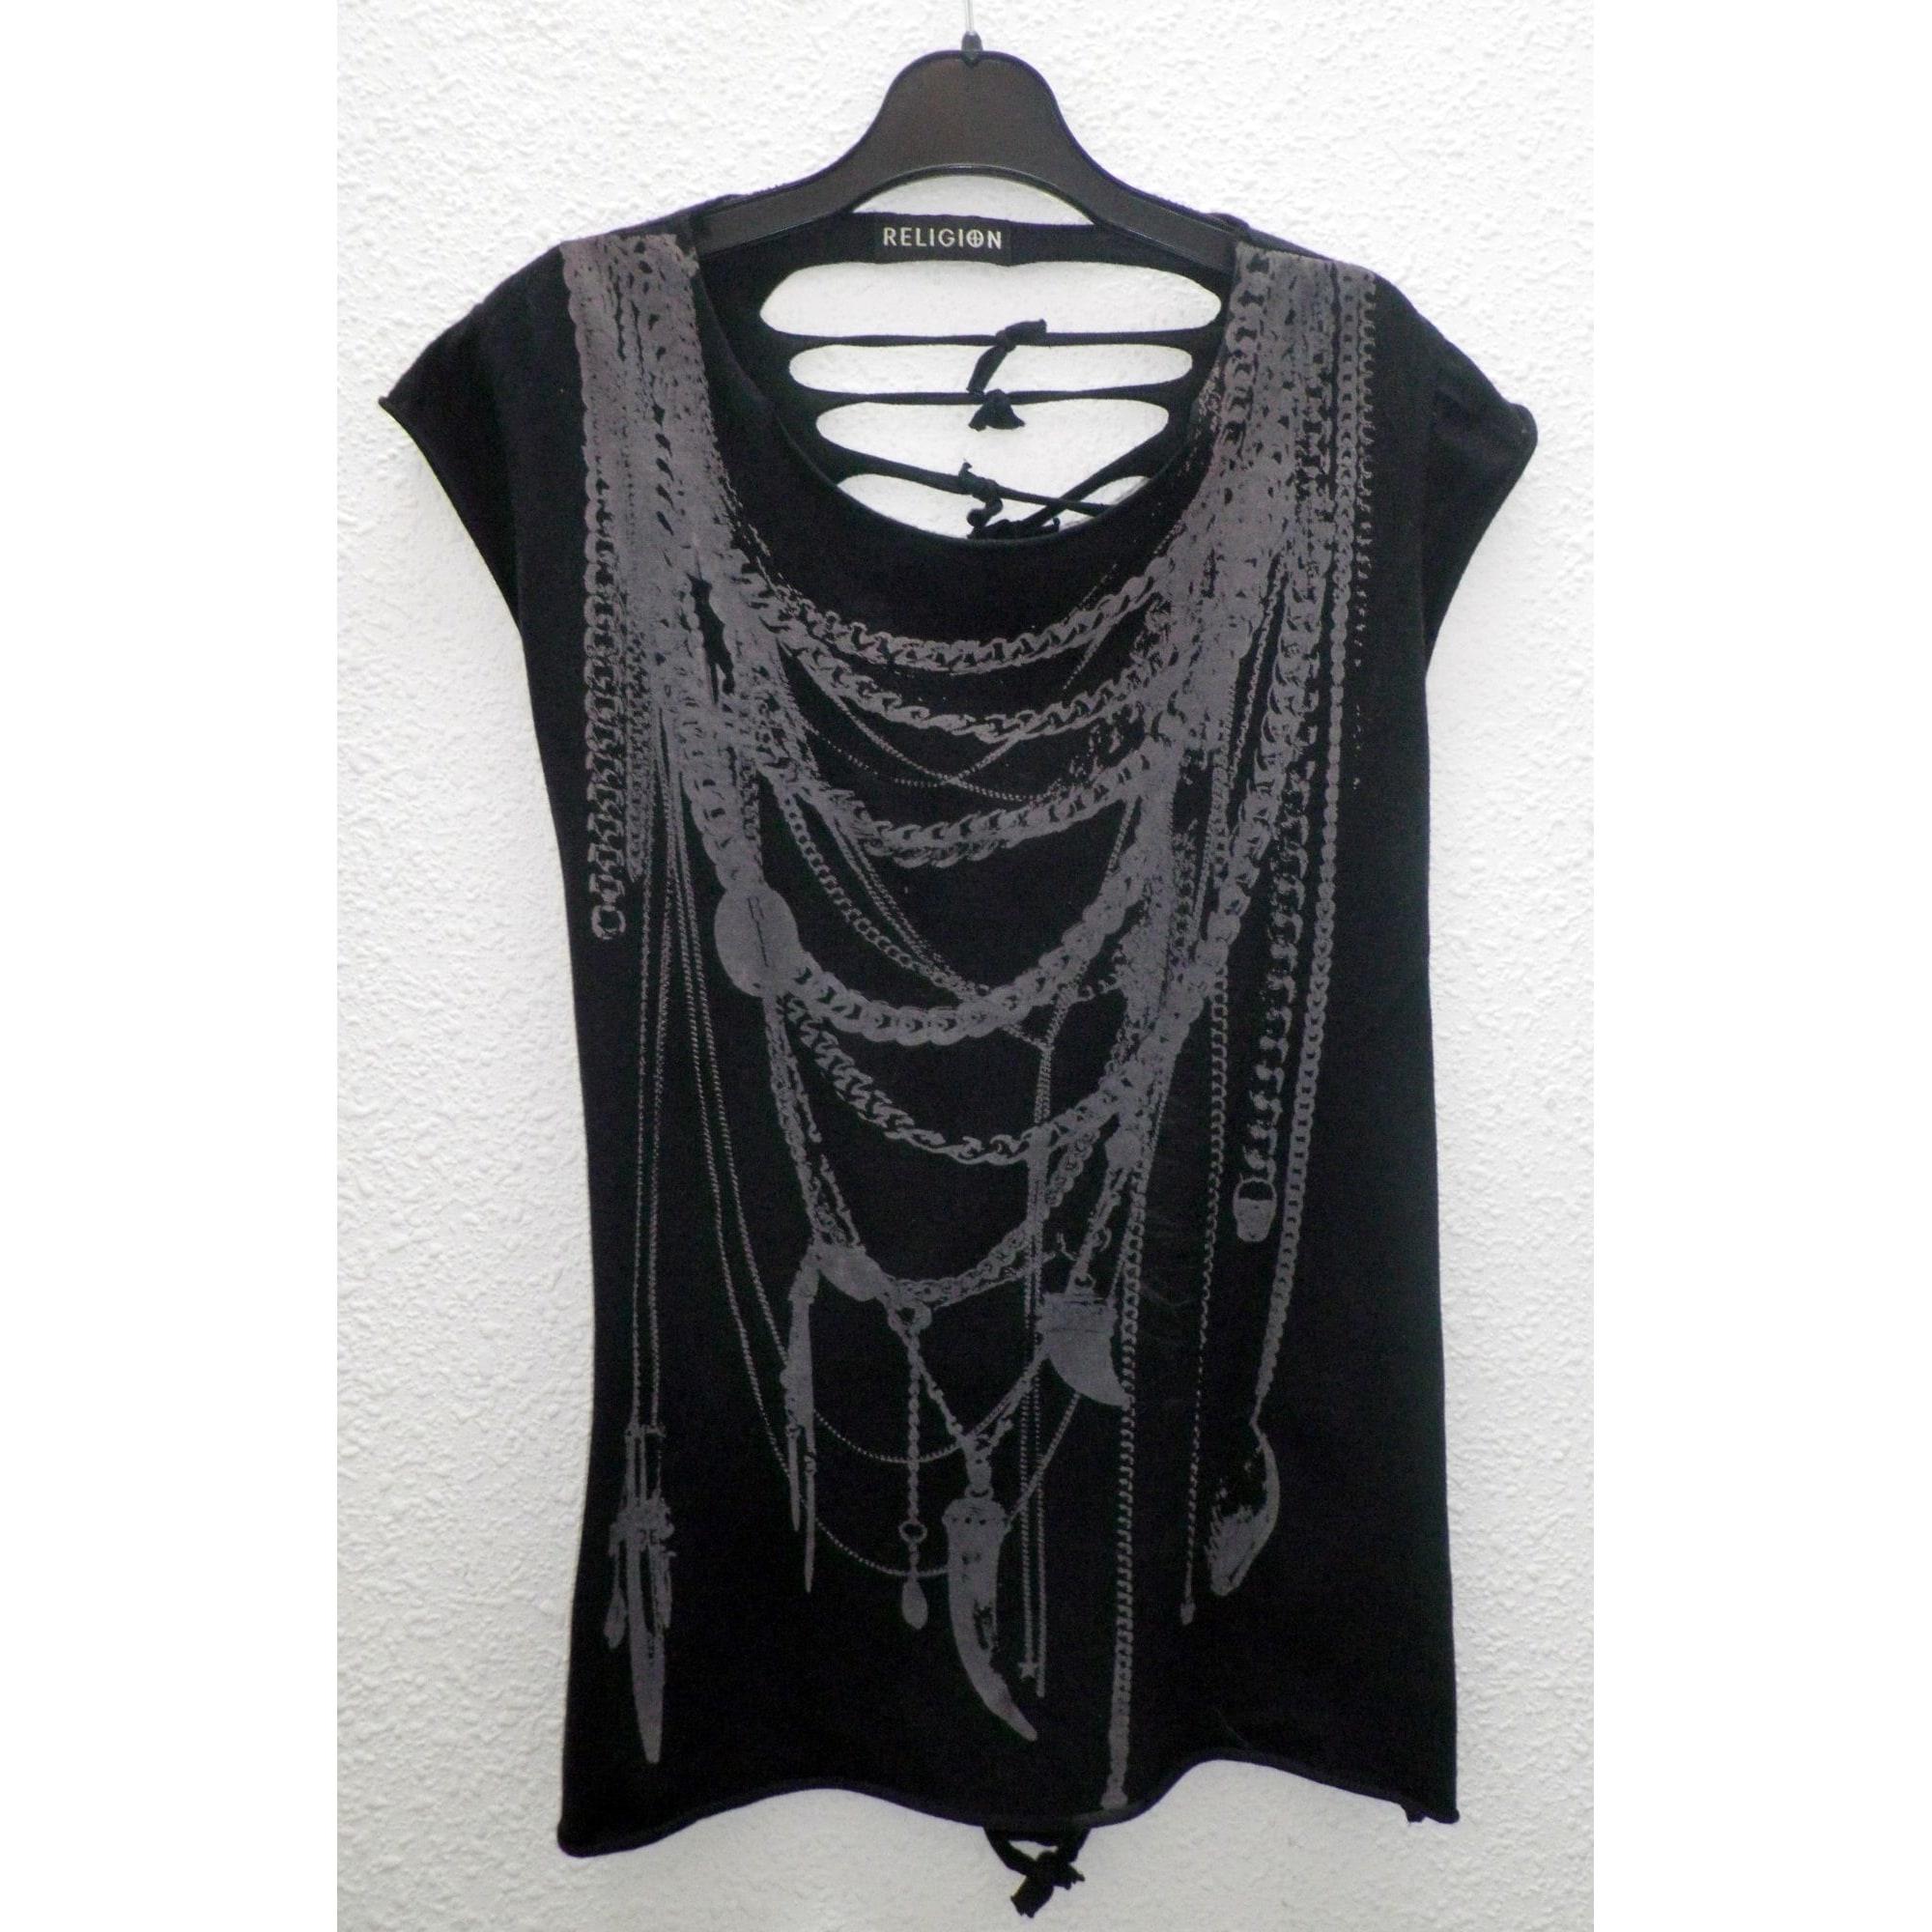 Top, tee-shirt RELIGION Noir